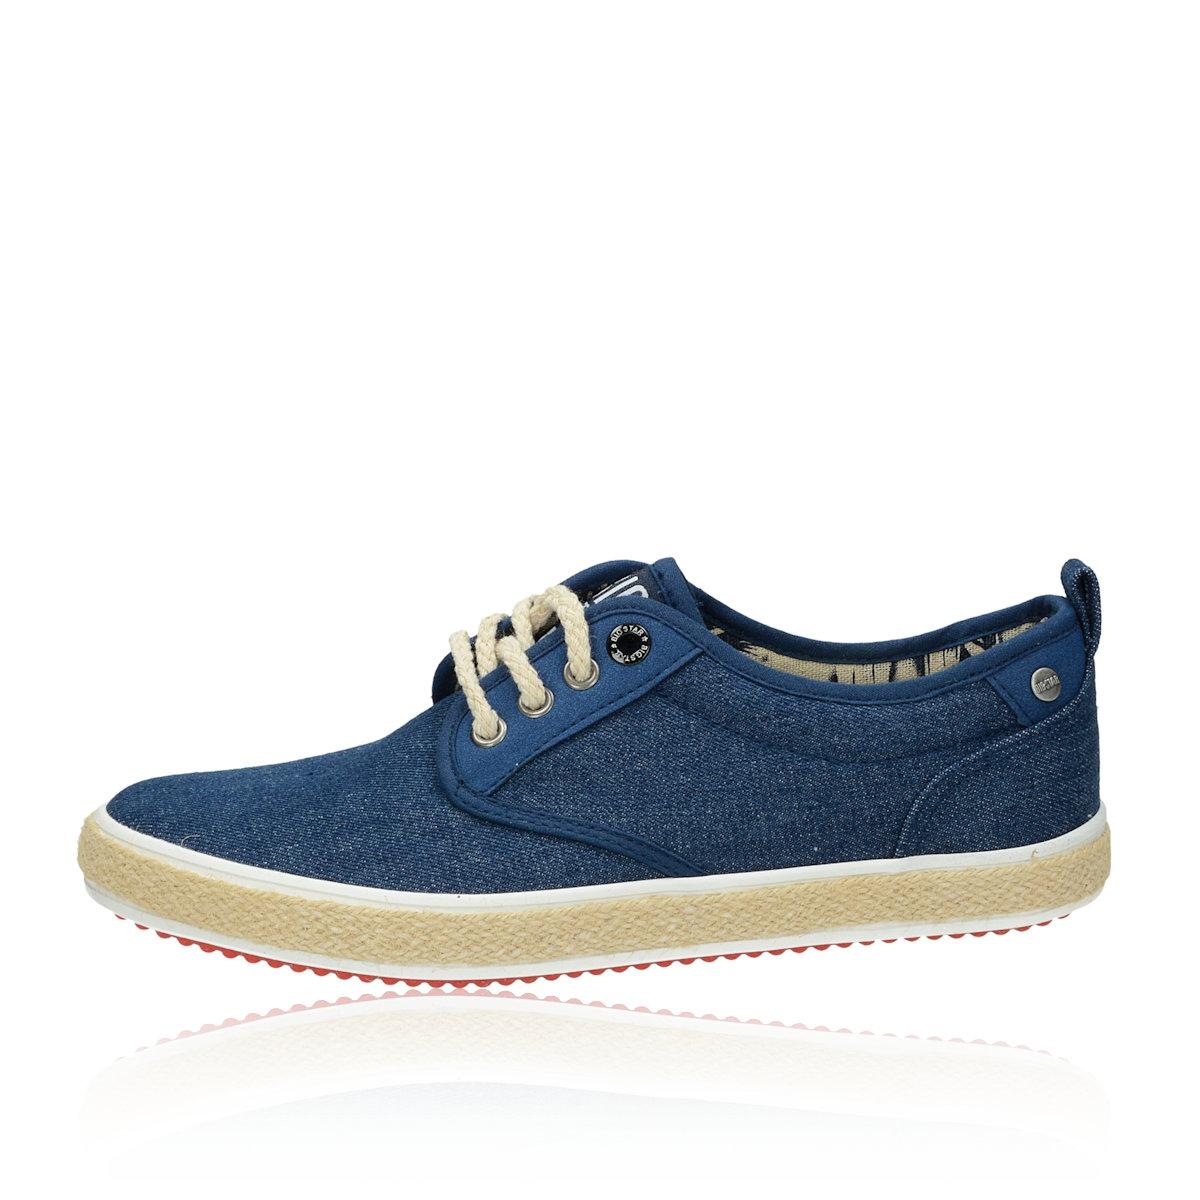 dd0311b4ea8e ... Big Star pánske textilné tenisky - modré ...